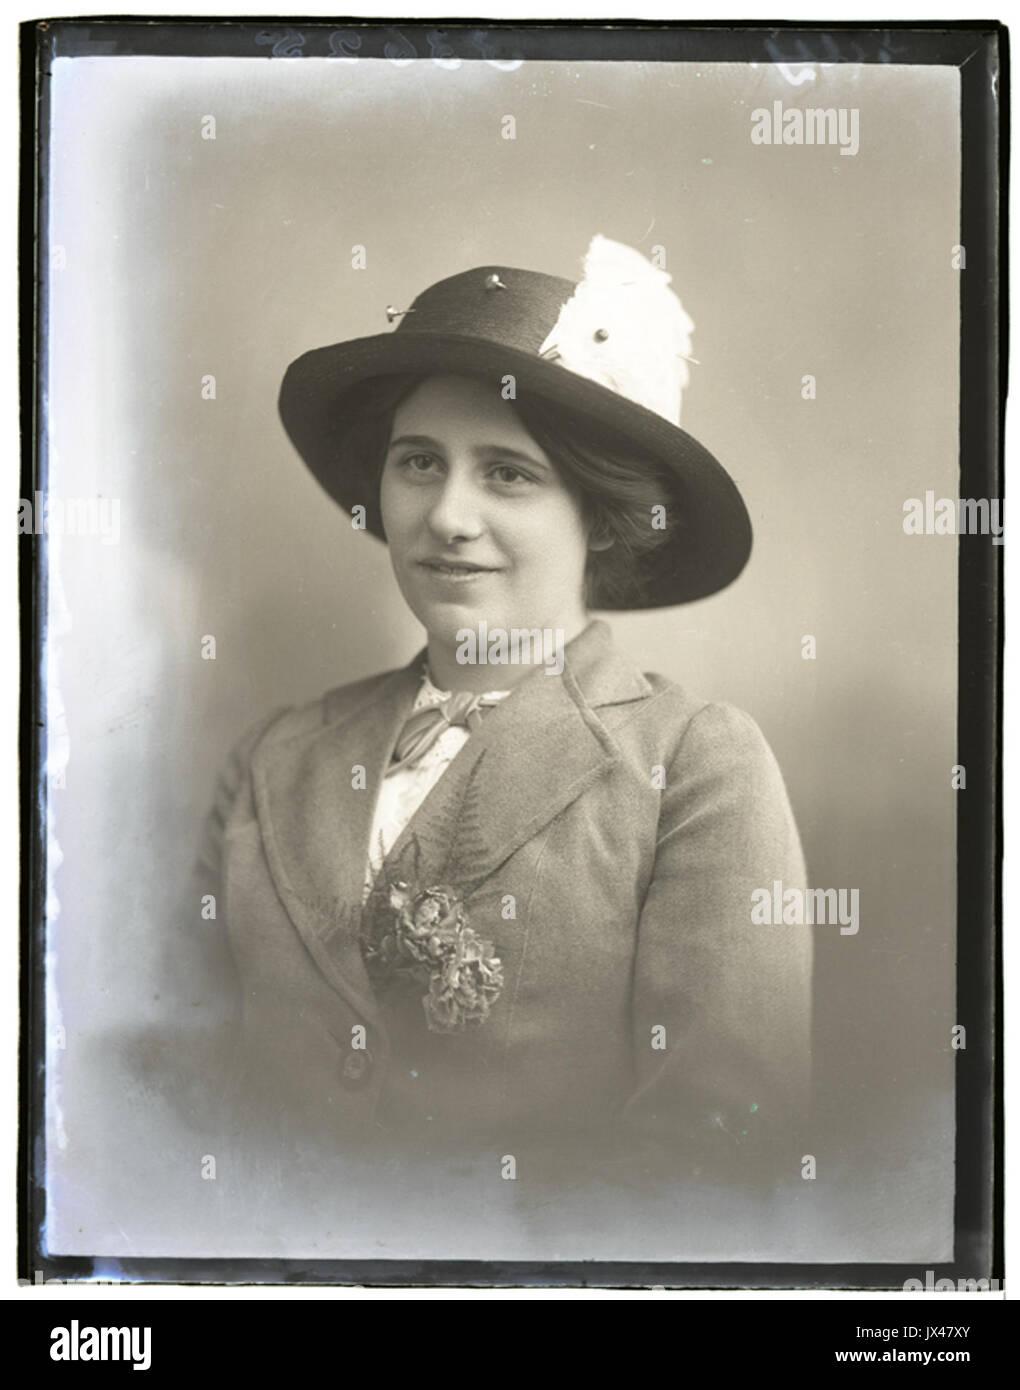 Miss Eely, 11 Nov 1913 (16702831932) - Stock Image